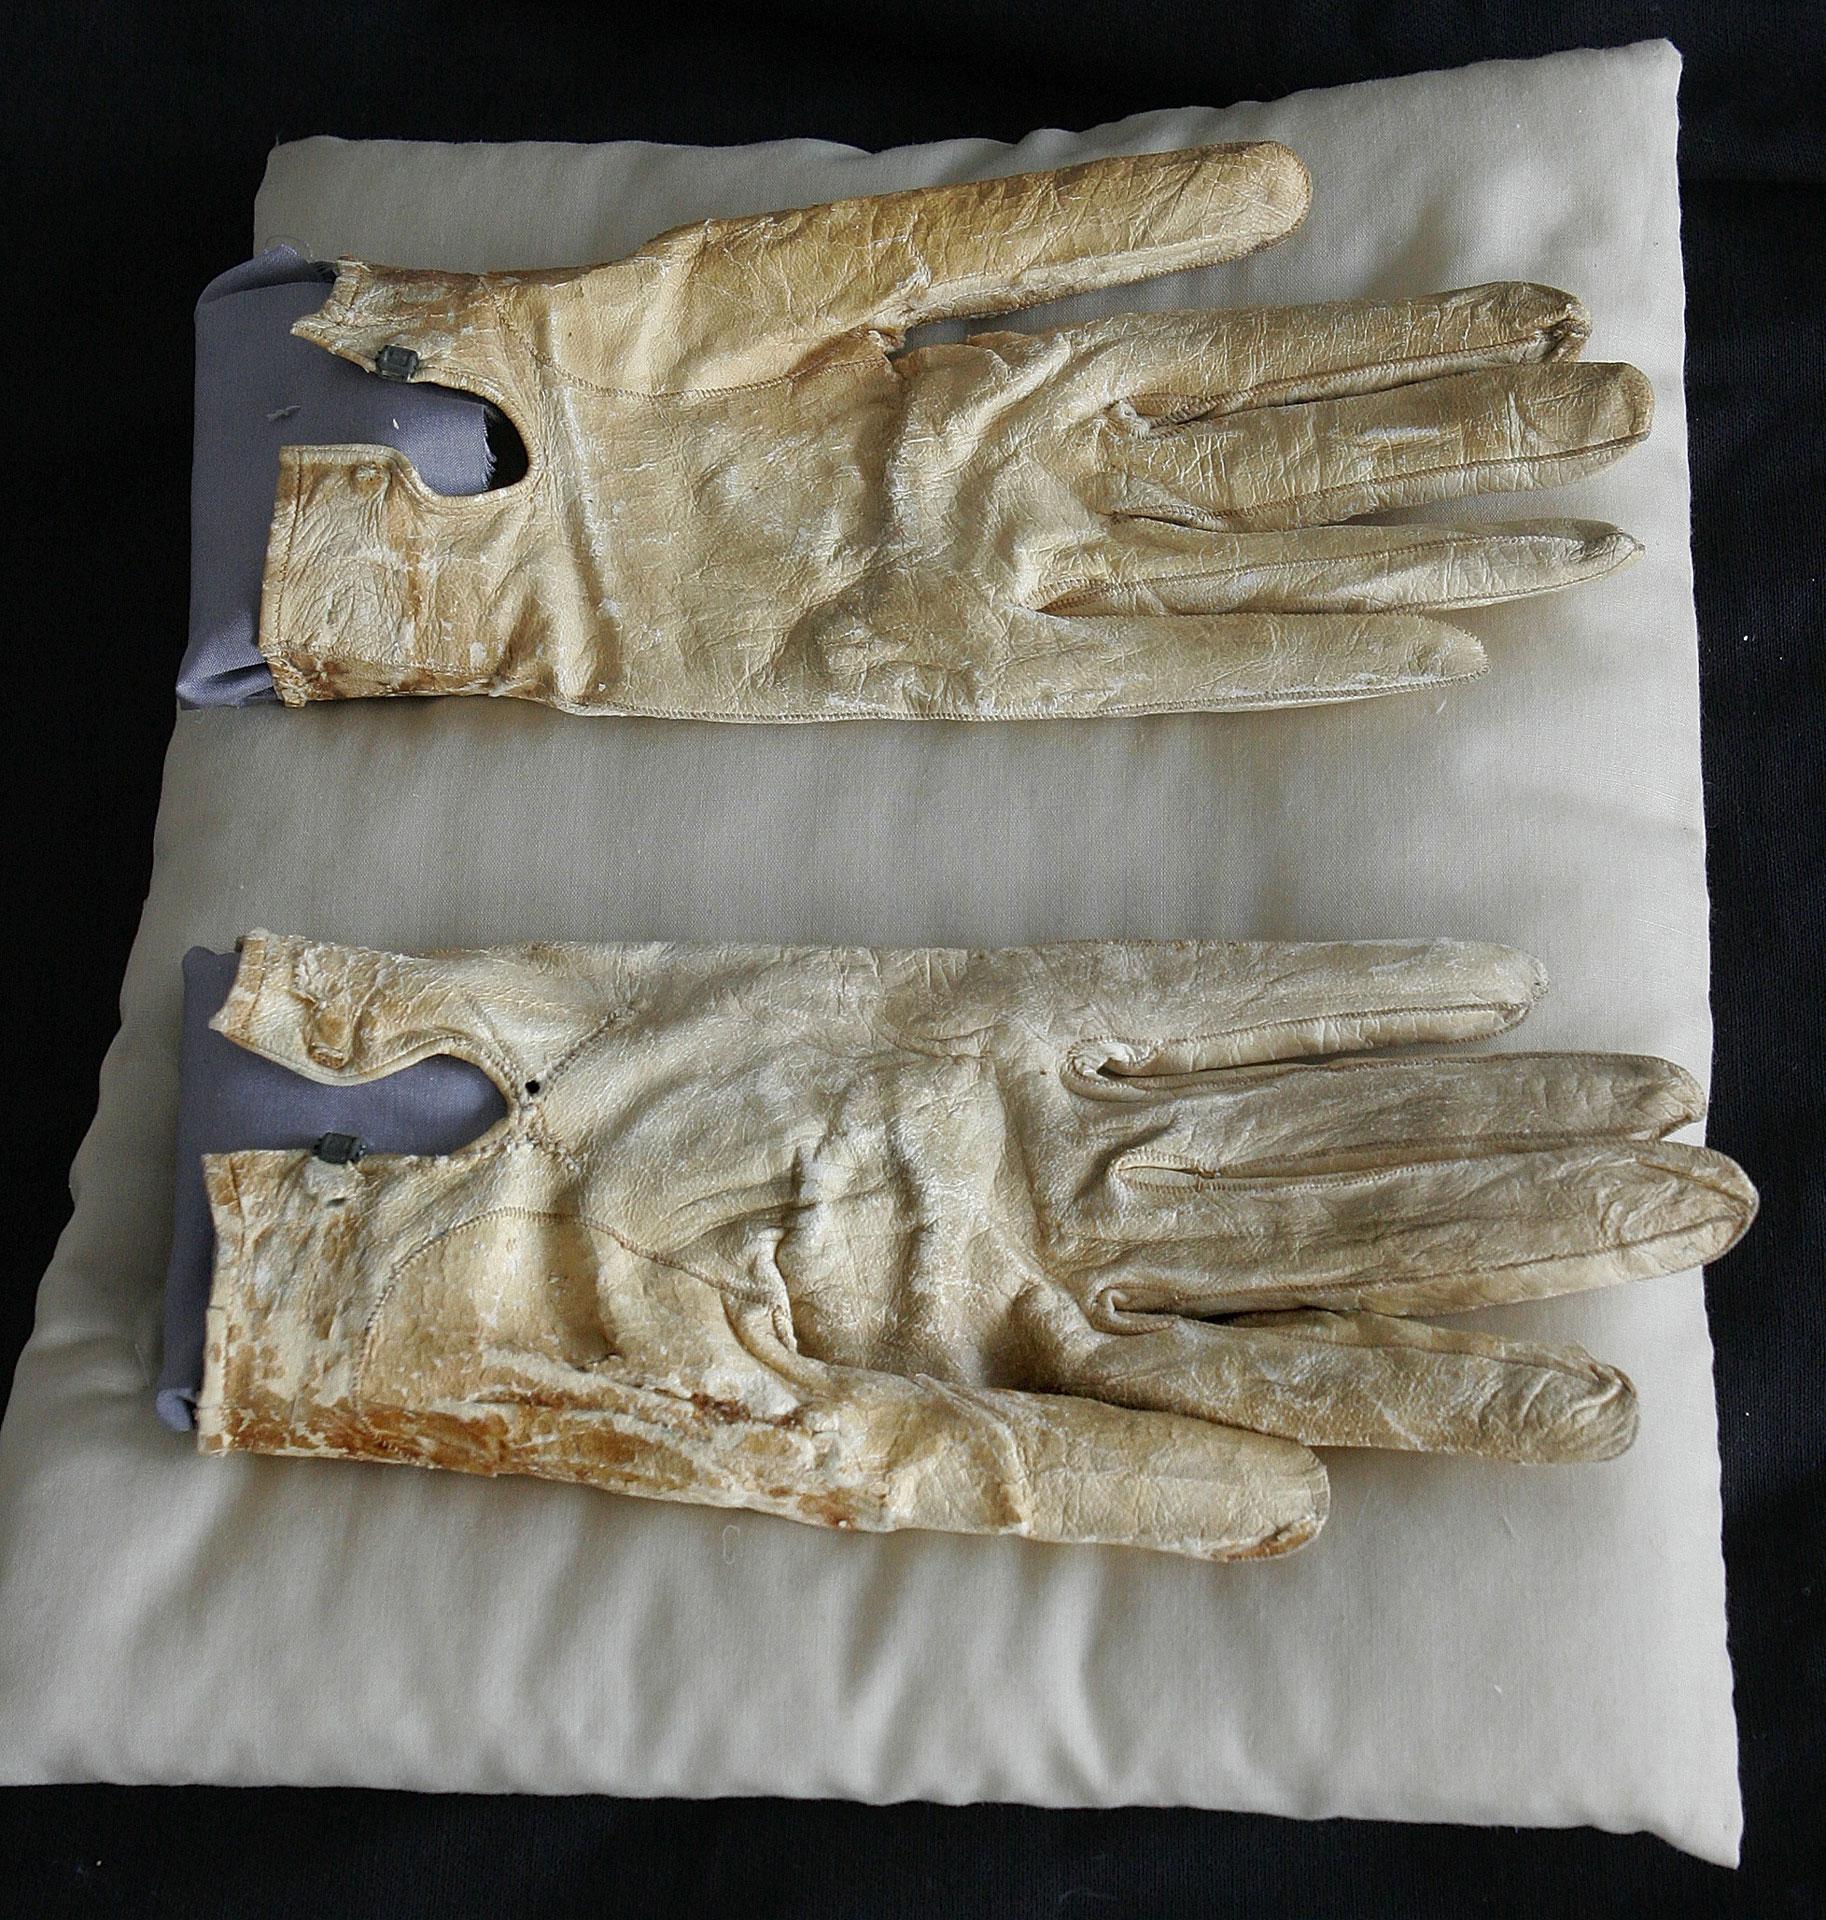 Lincoln's gloves